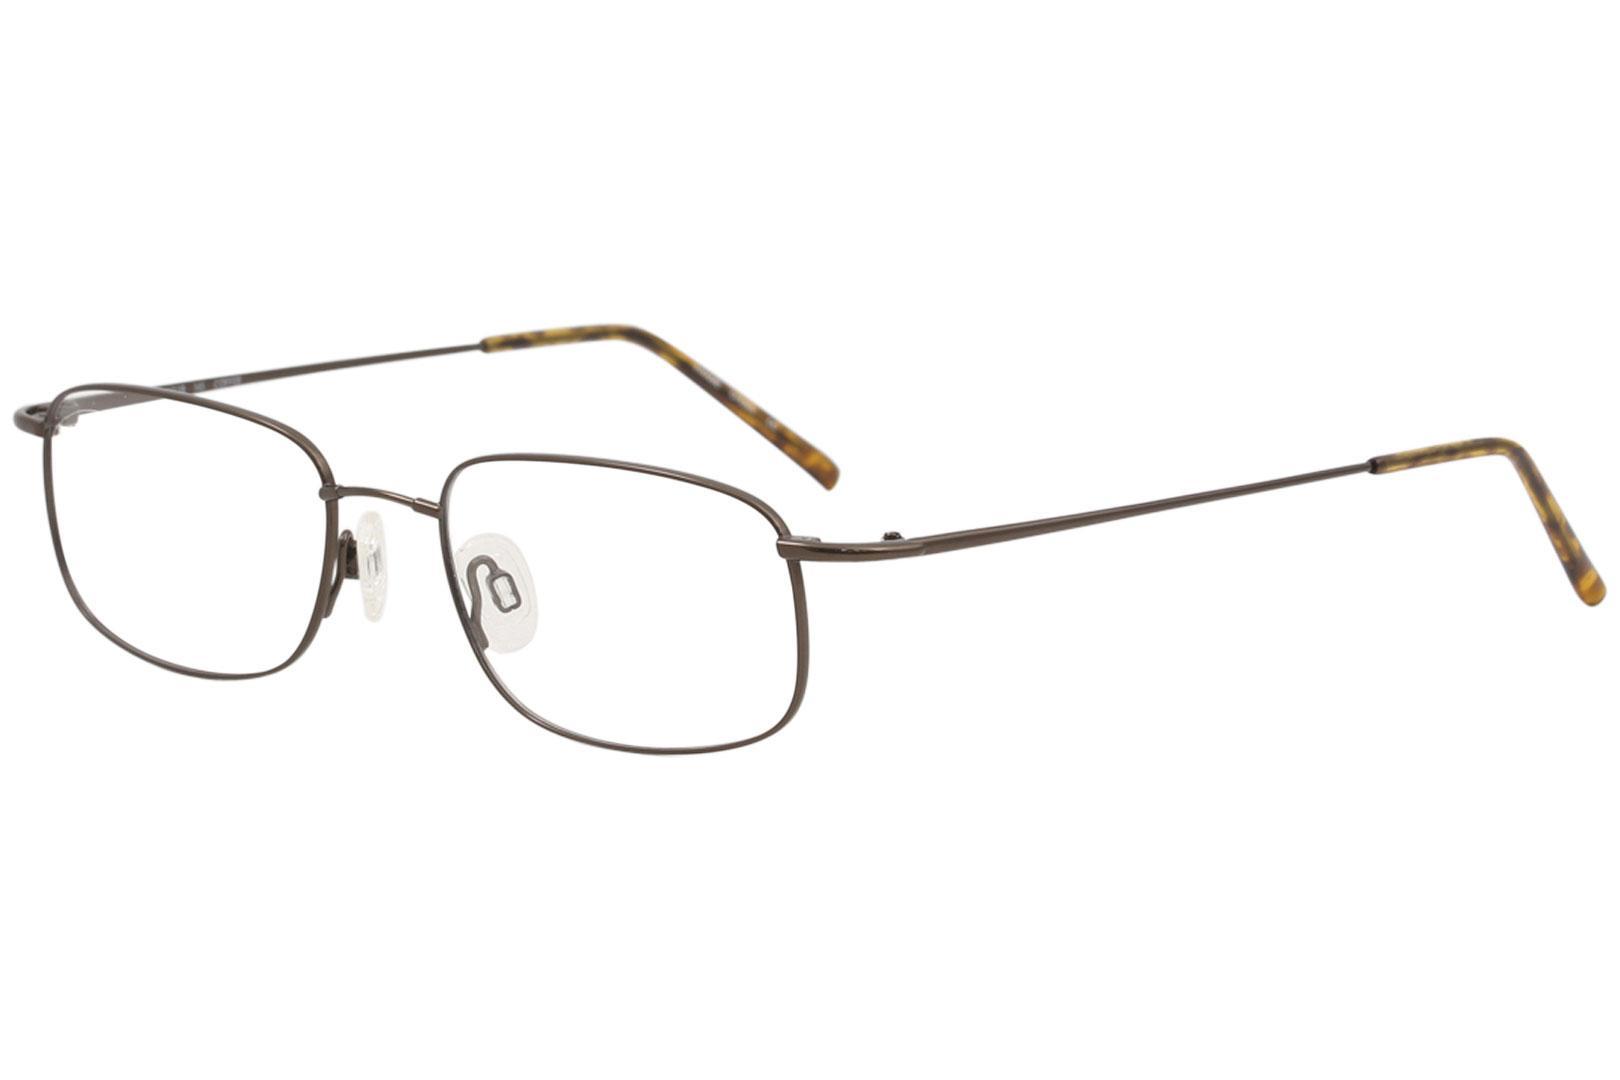 cf257e6e2a Flexon Men s Eyeglasses 610 Full Rim Optical Frame by Flexon. Touch to zoom